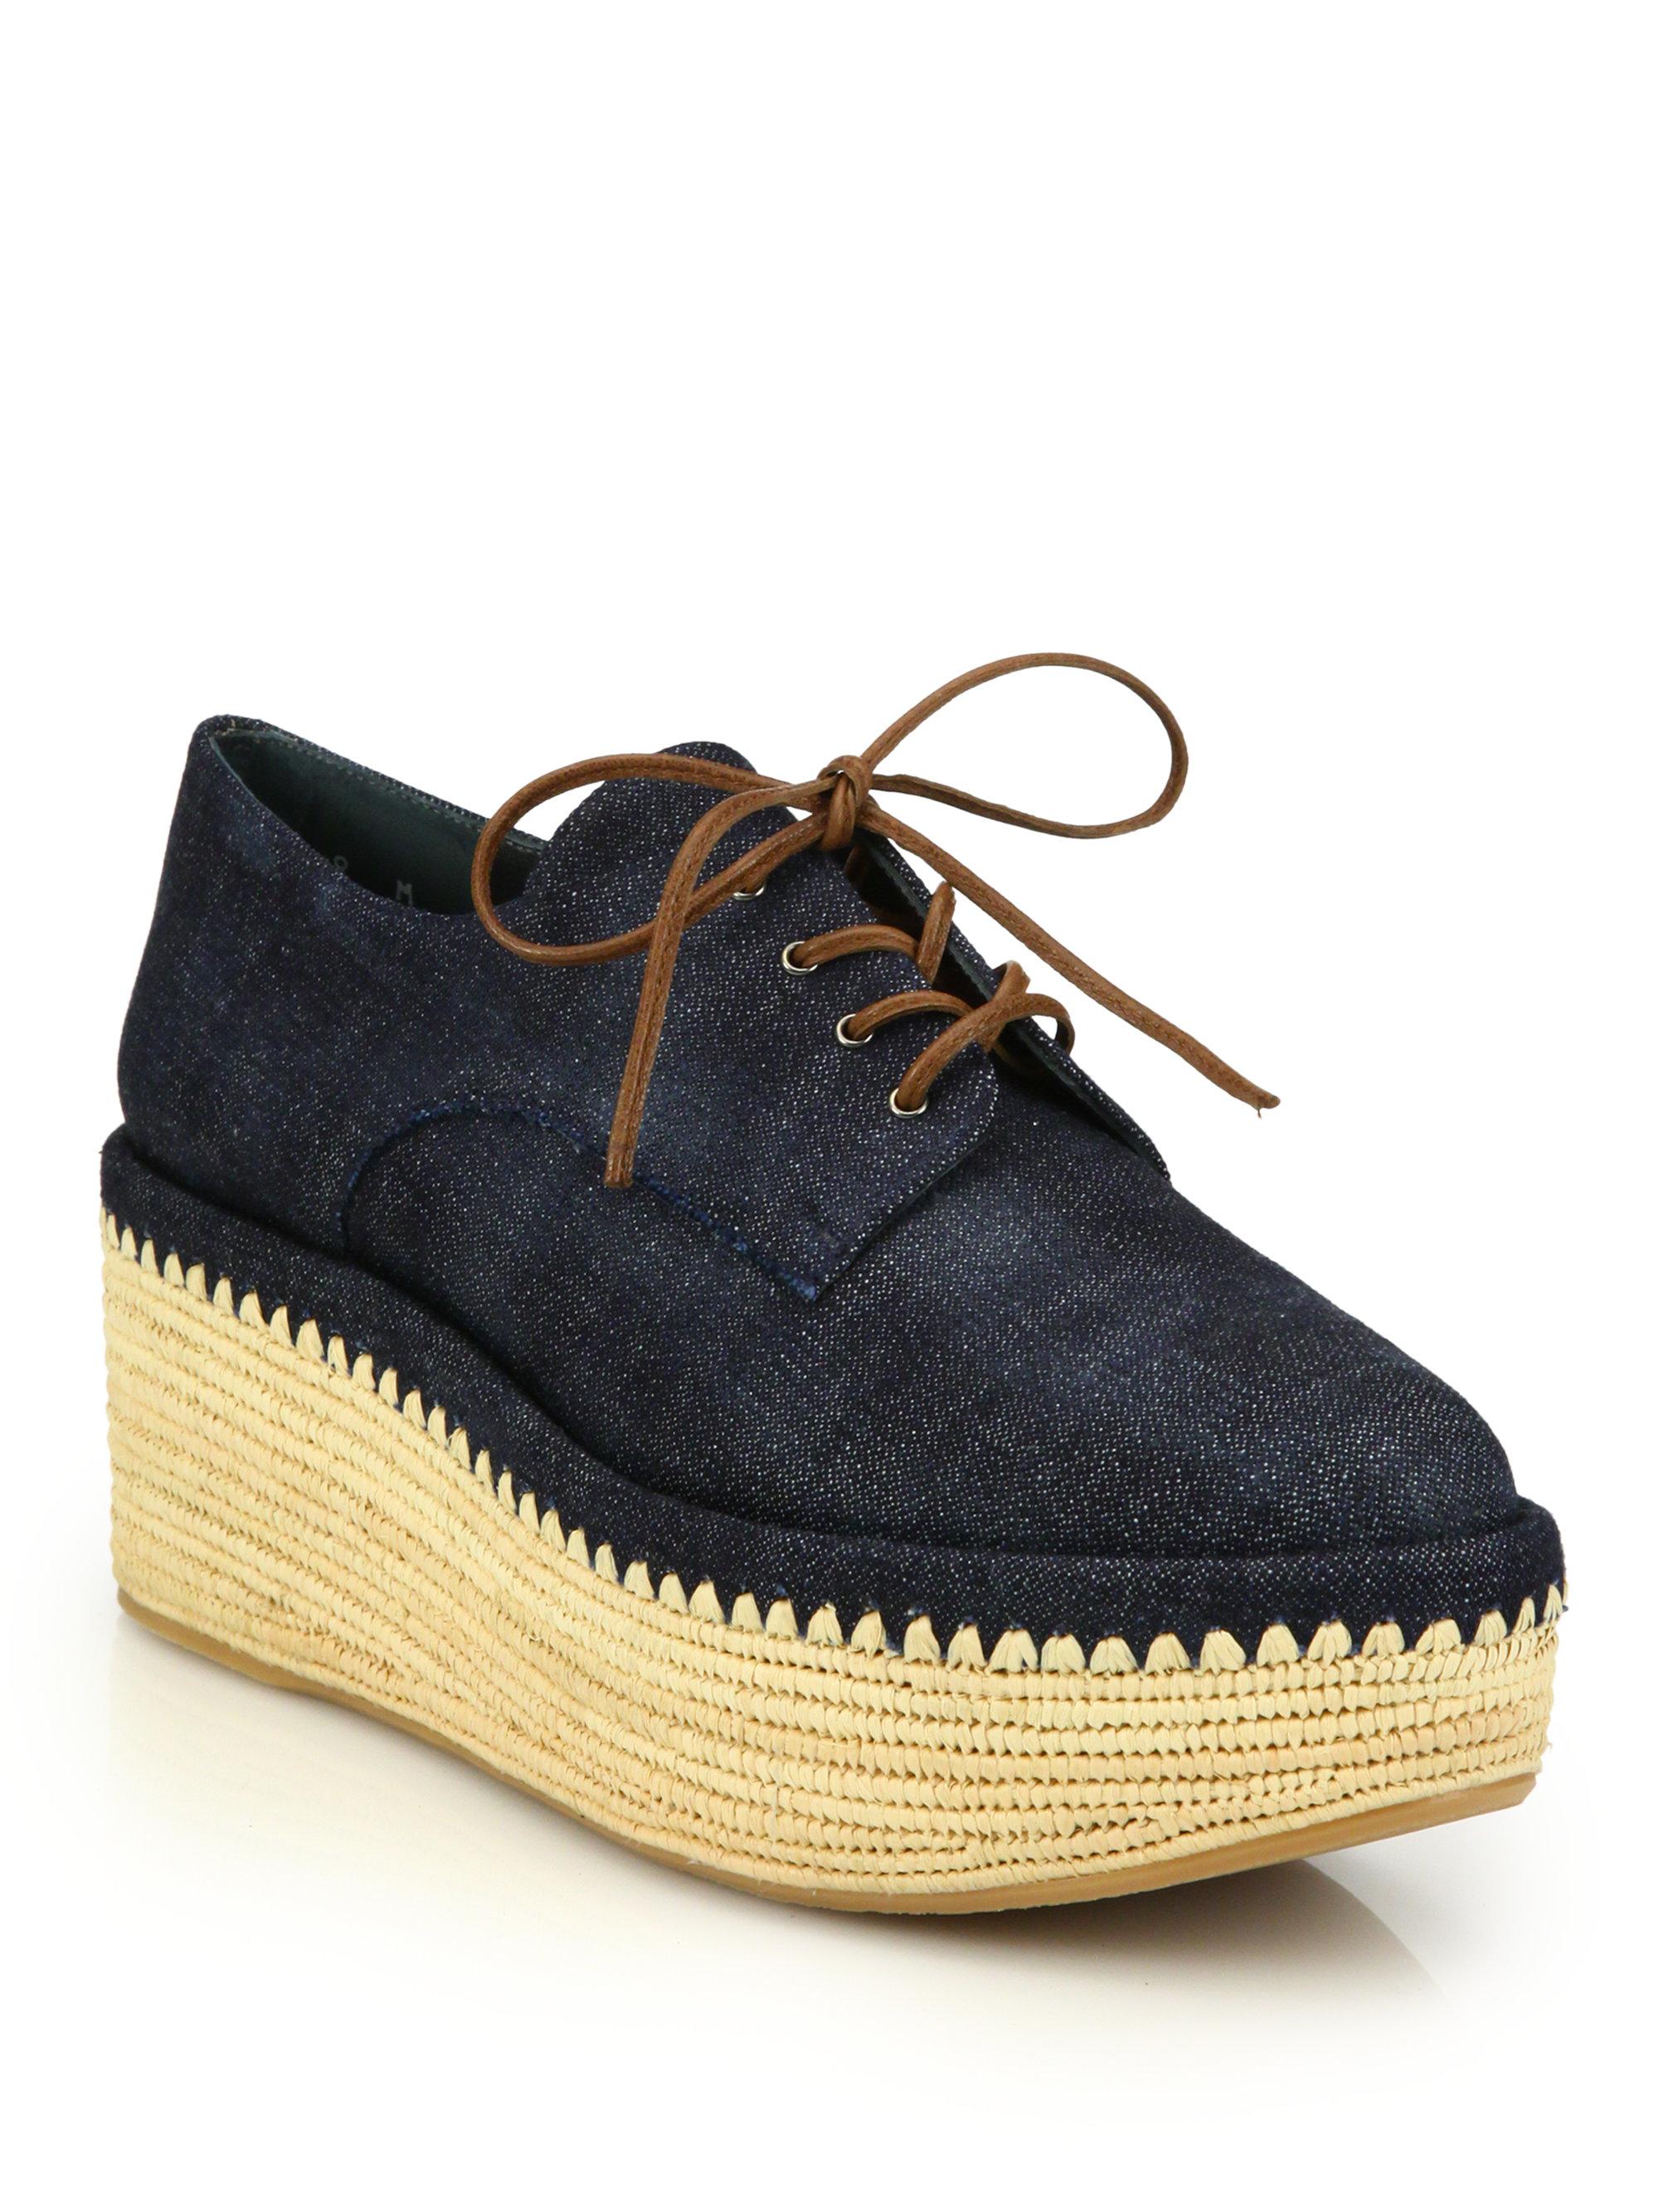 2e6ccb29d57 Lyst - Stuart Weitzman Kent Raffia Denim Platform Creeper Shoes in Blue